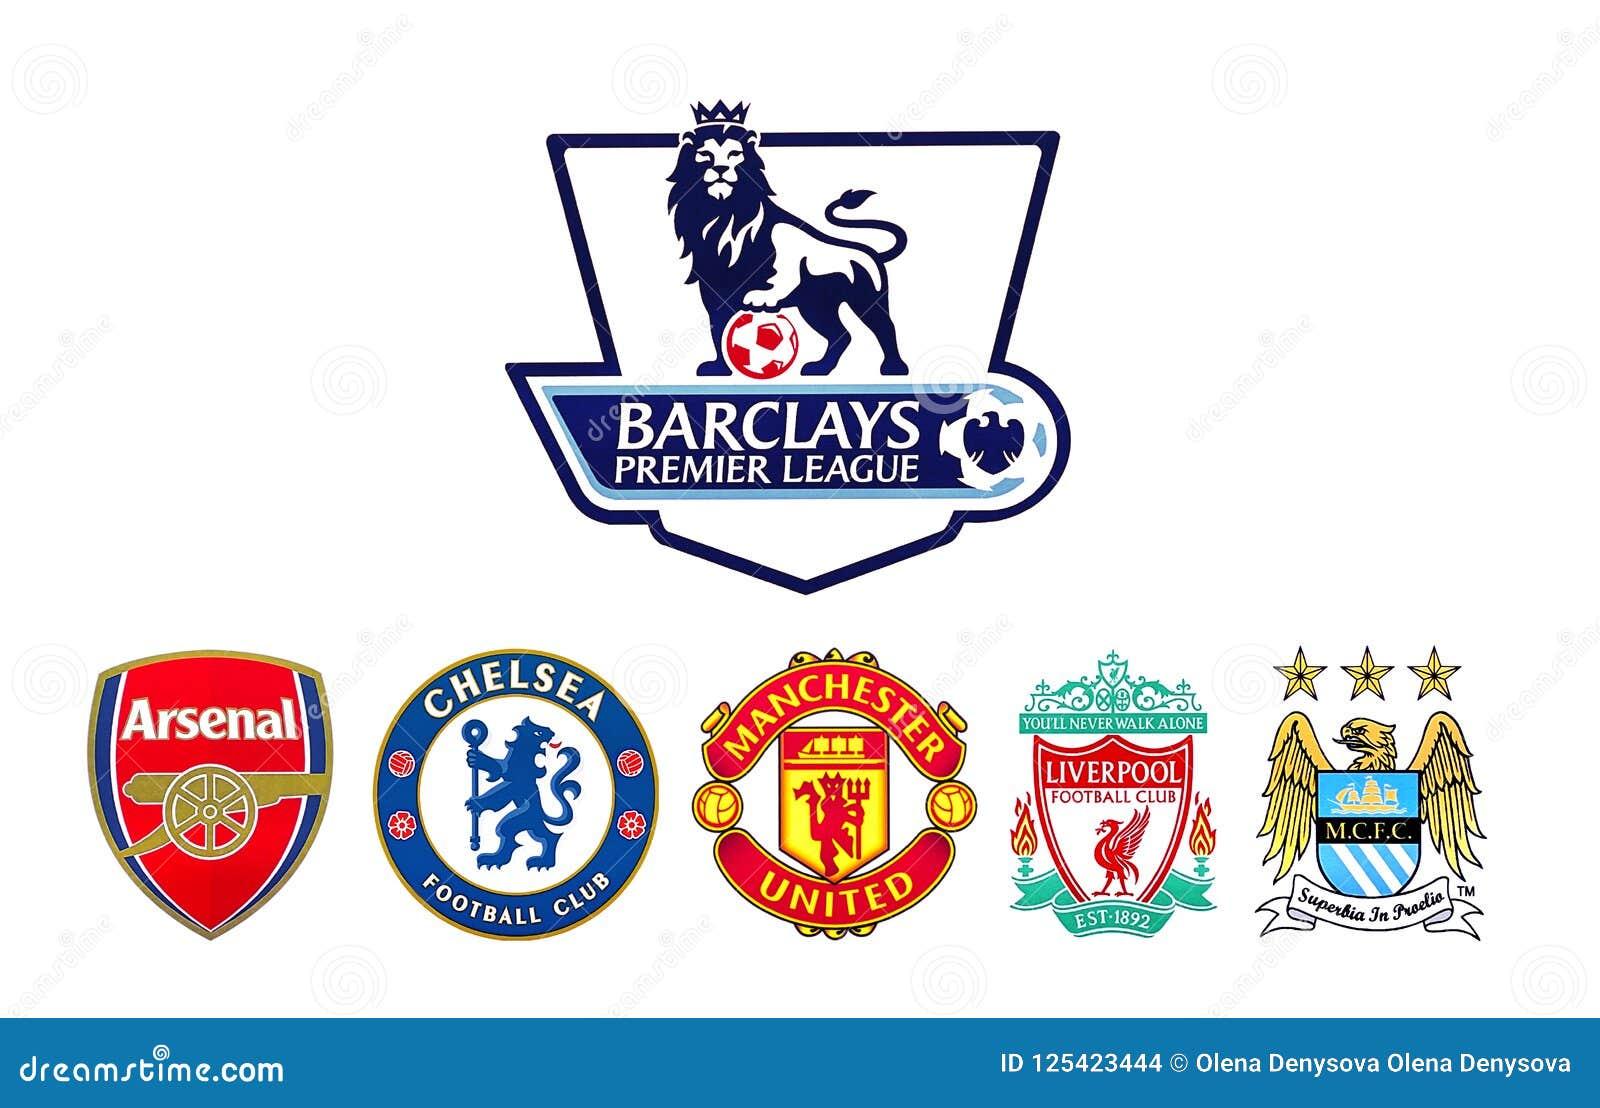 Ukrainian football clubs: a selection of sites